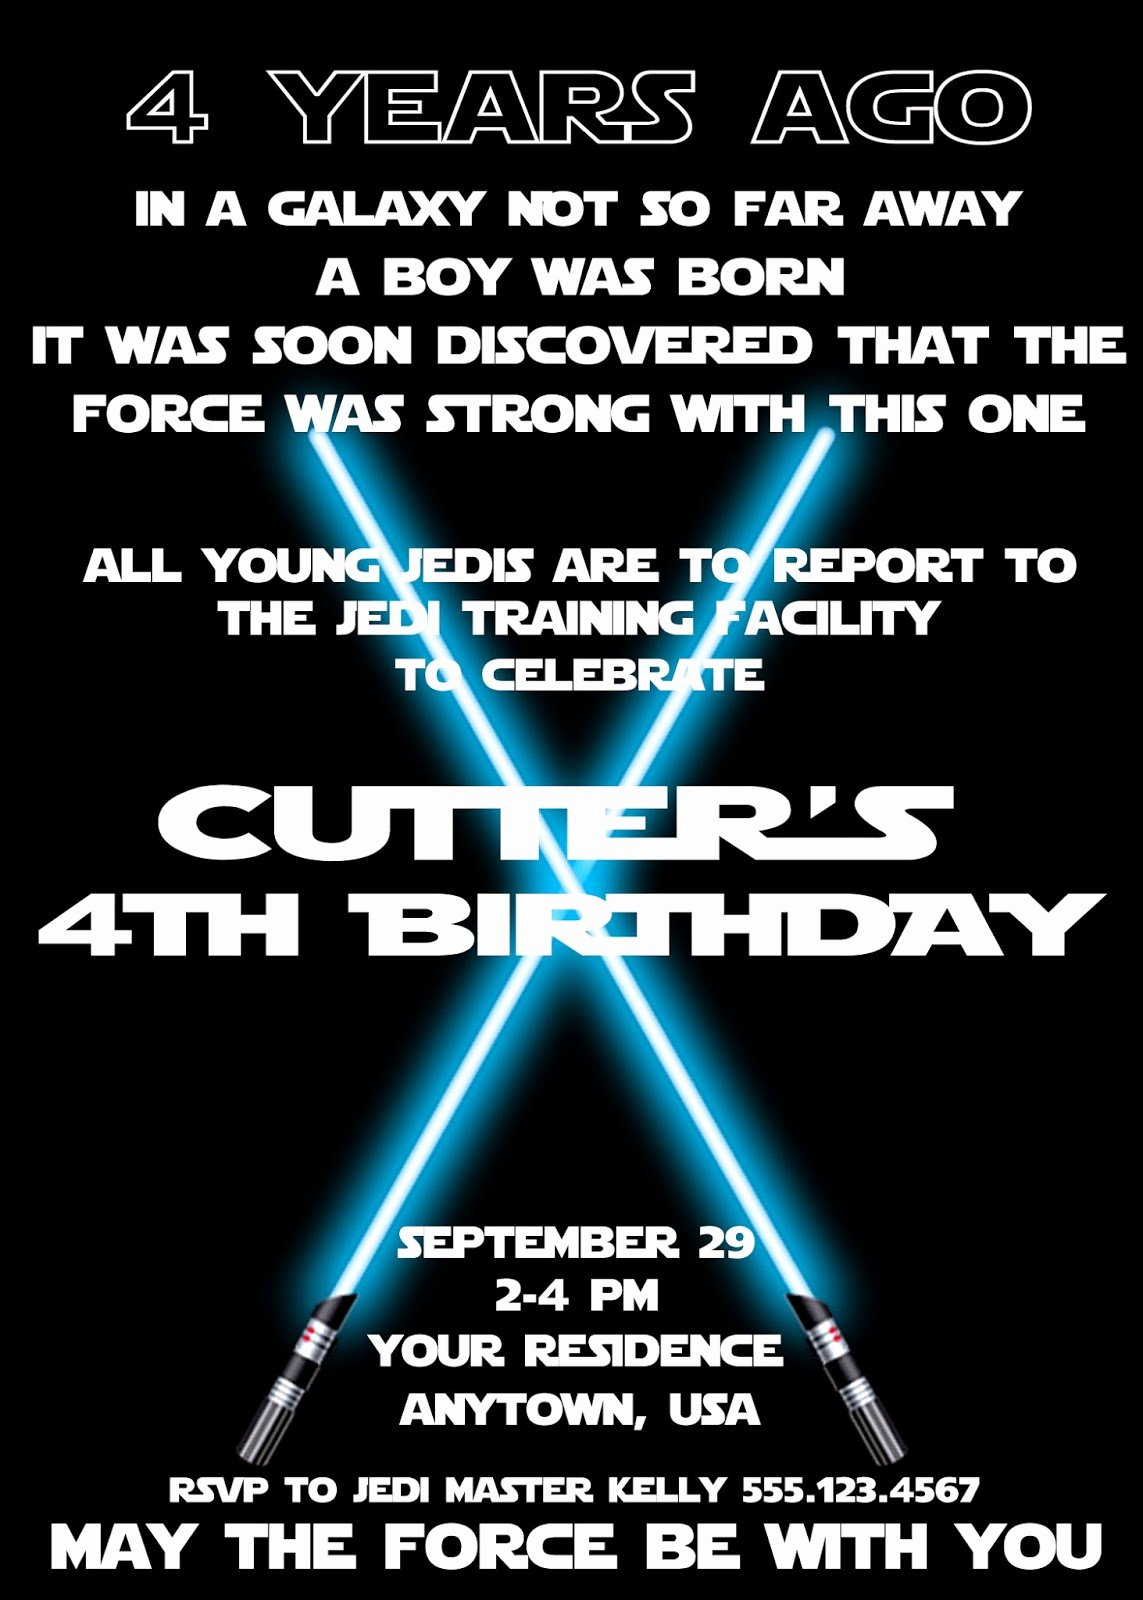 Stars Wars Birthday Invitations Elegant Plan An Amazing Star Wars Birthday Party